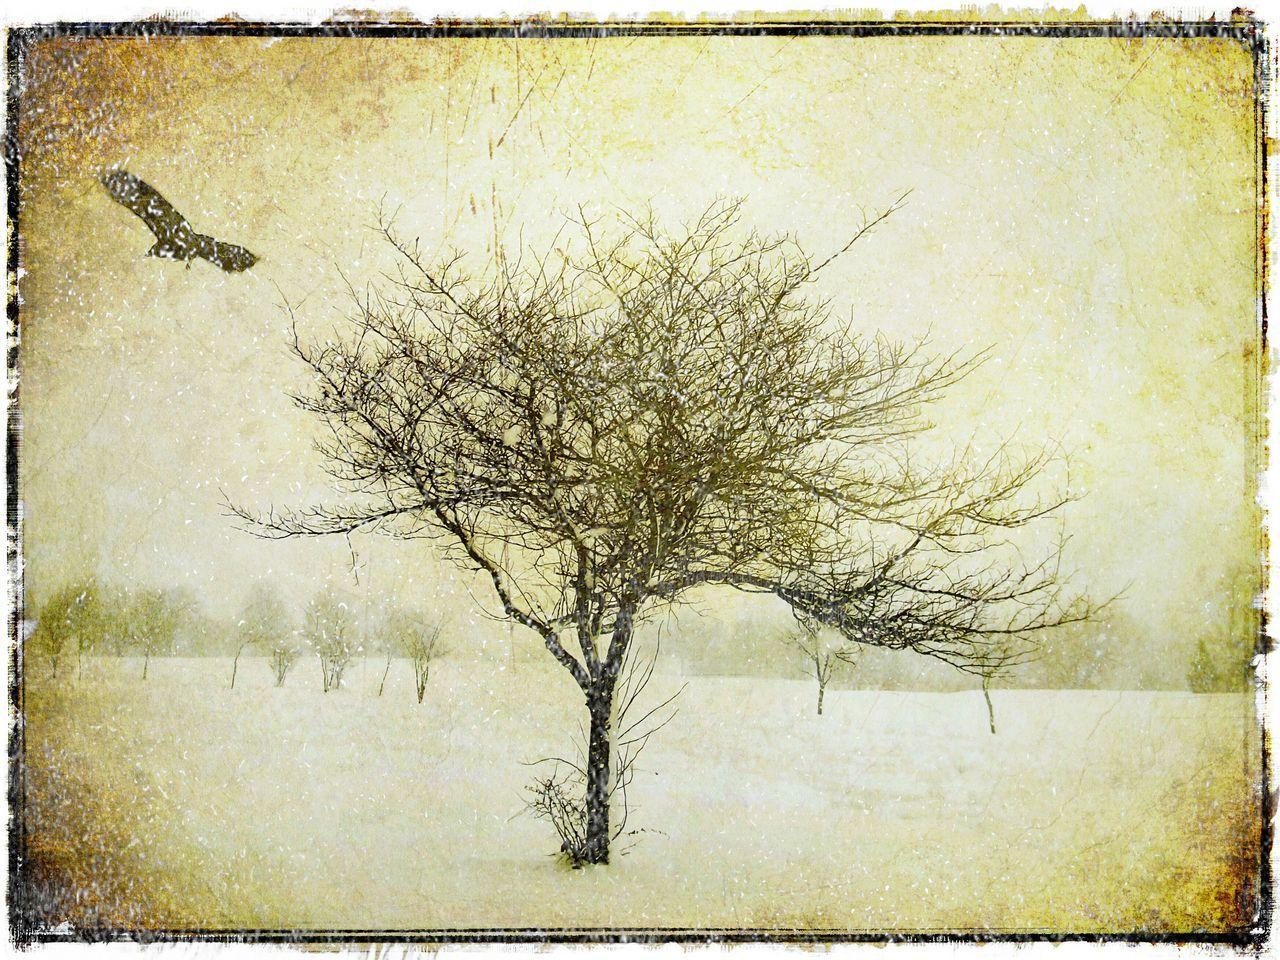 Snow fall in Heston. Snow Snowfall Tree In Snow Winter Trees Snowminimals White Album White Collection Snow ❄ Snowing WhiteCollection